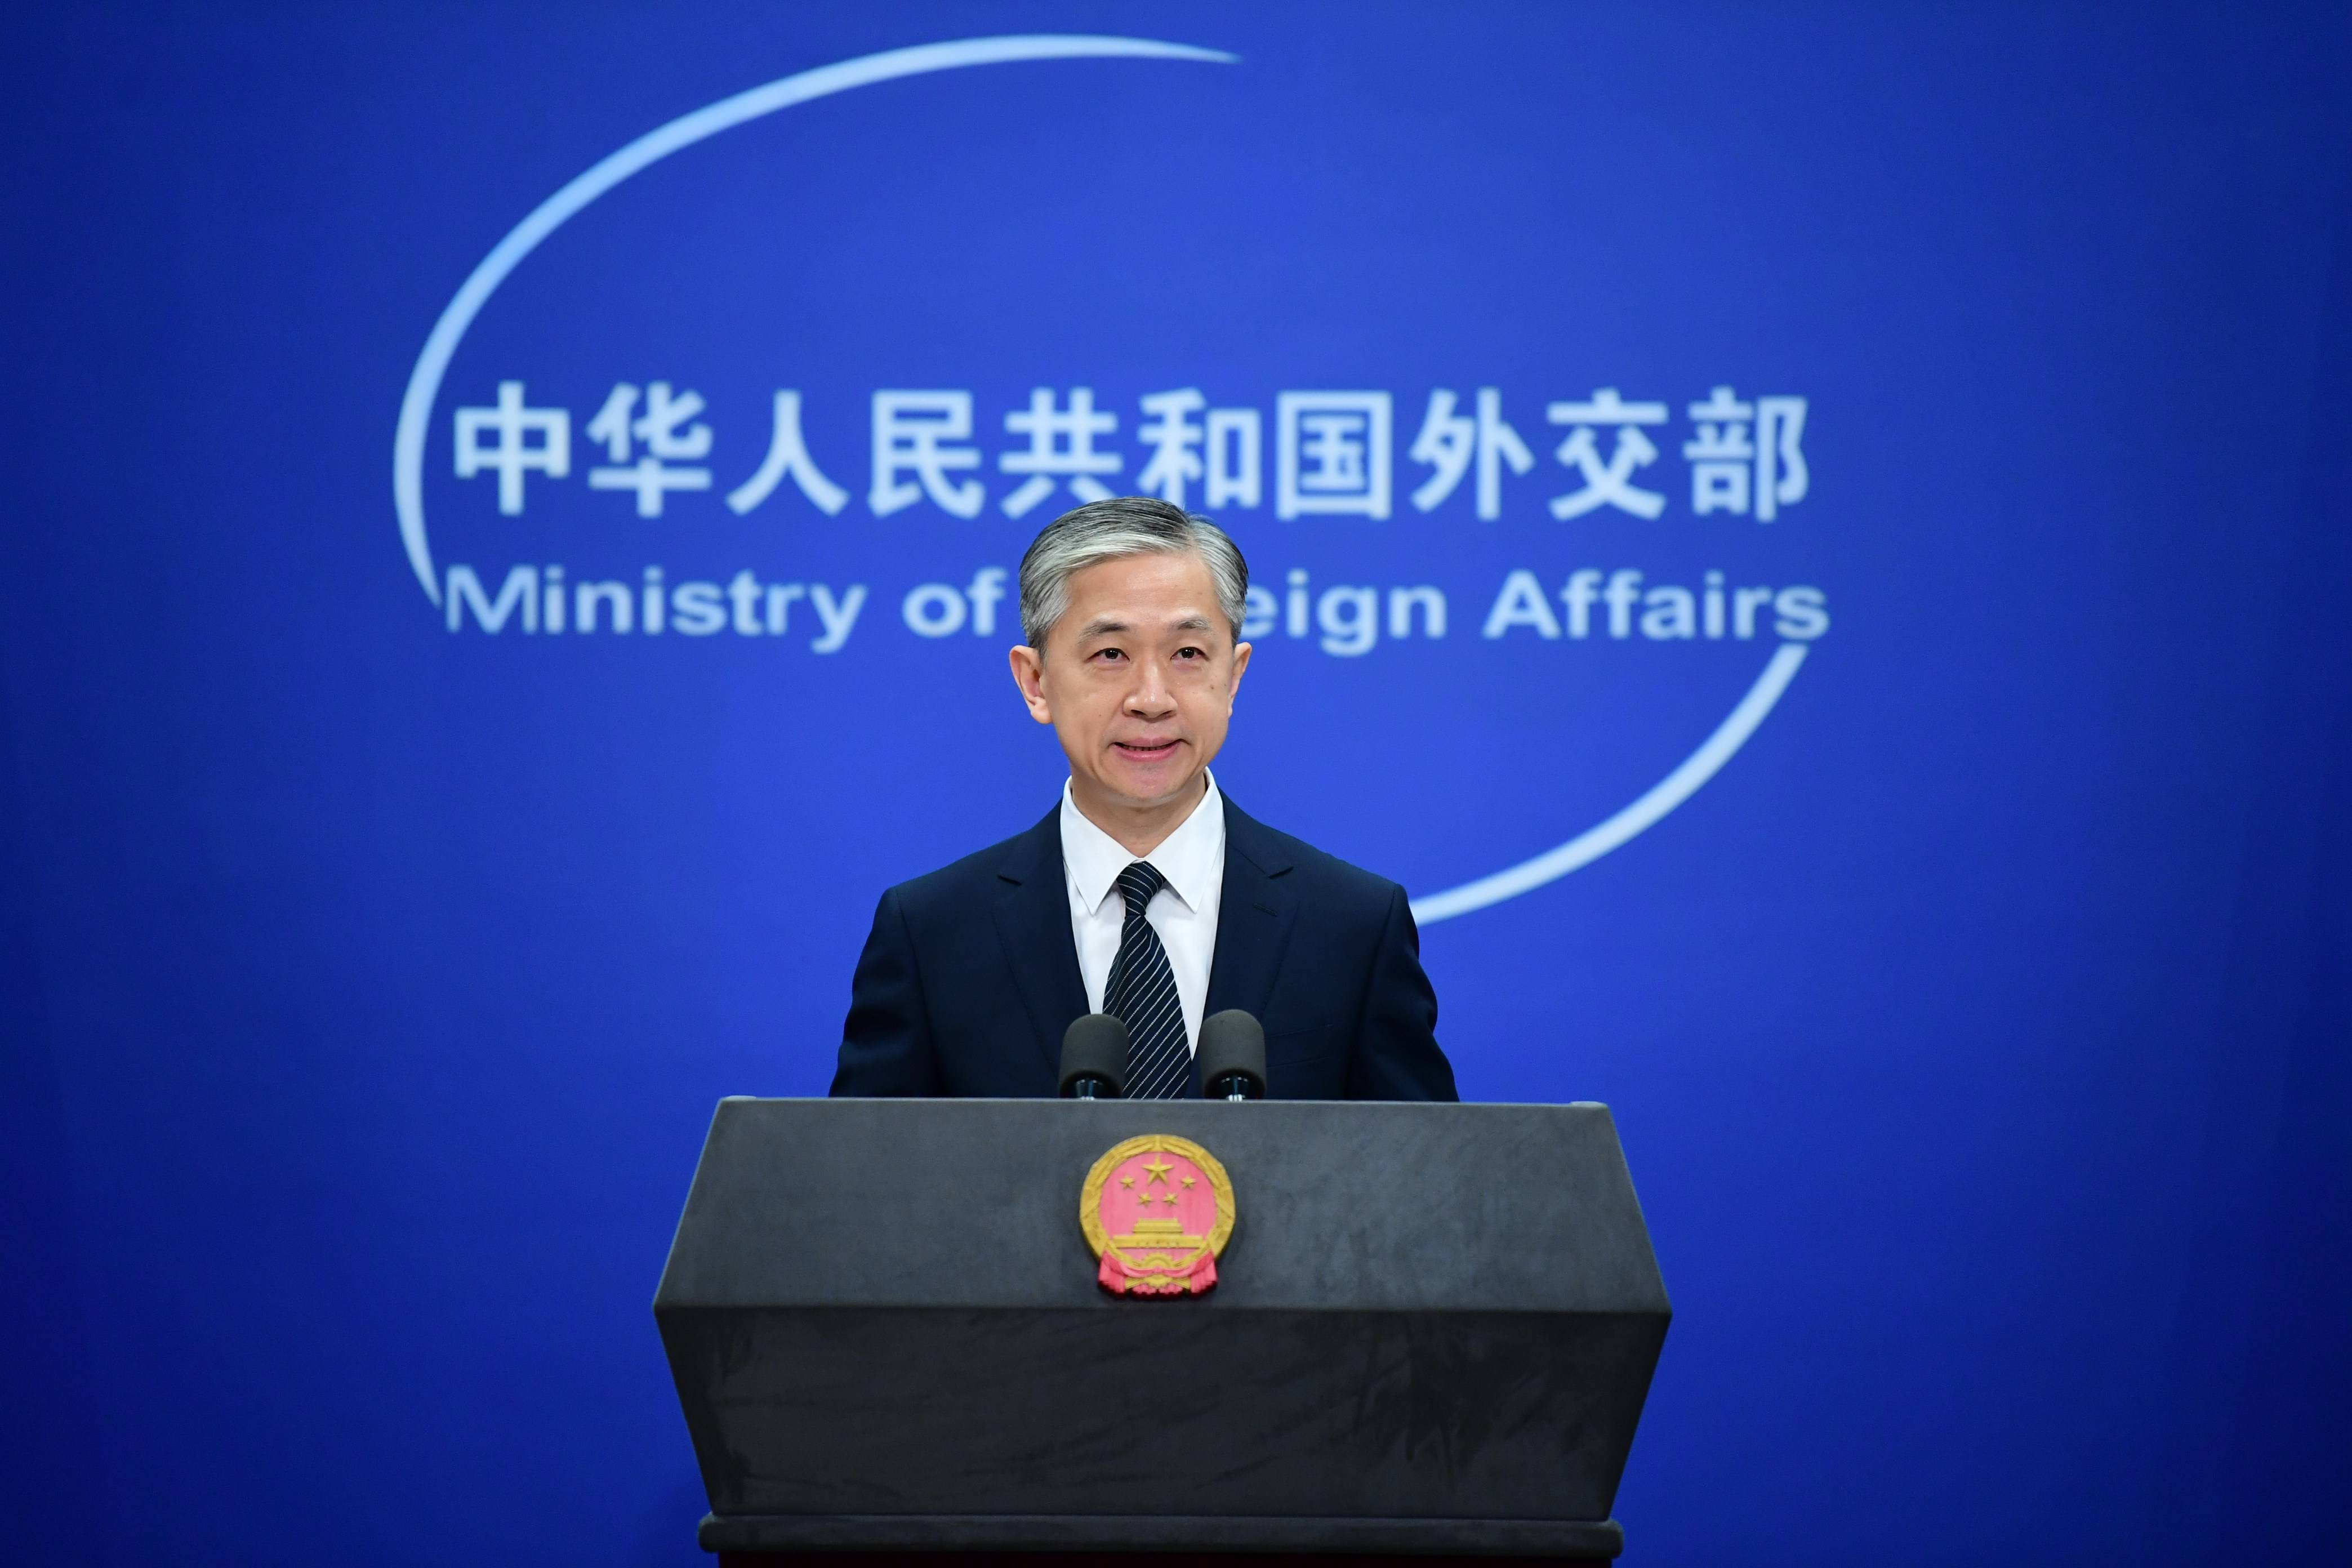 China urges UK to correct mistakes, stop political manipulation